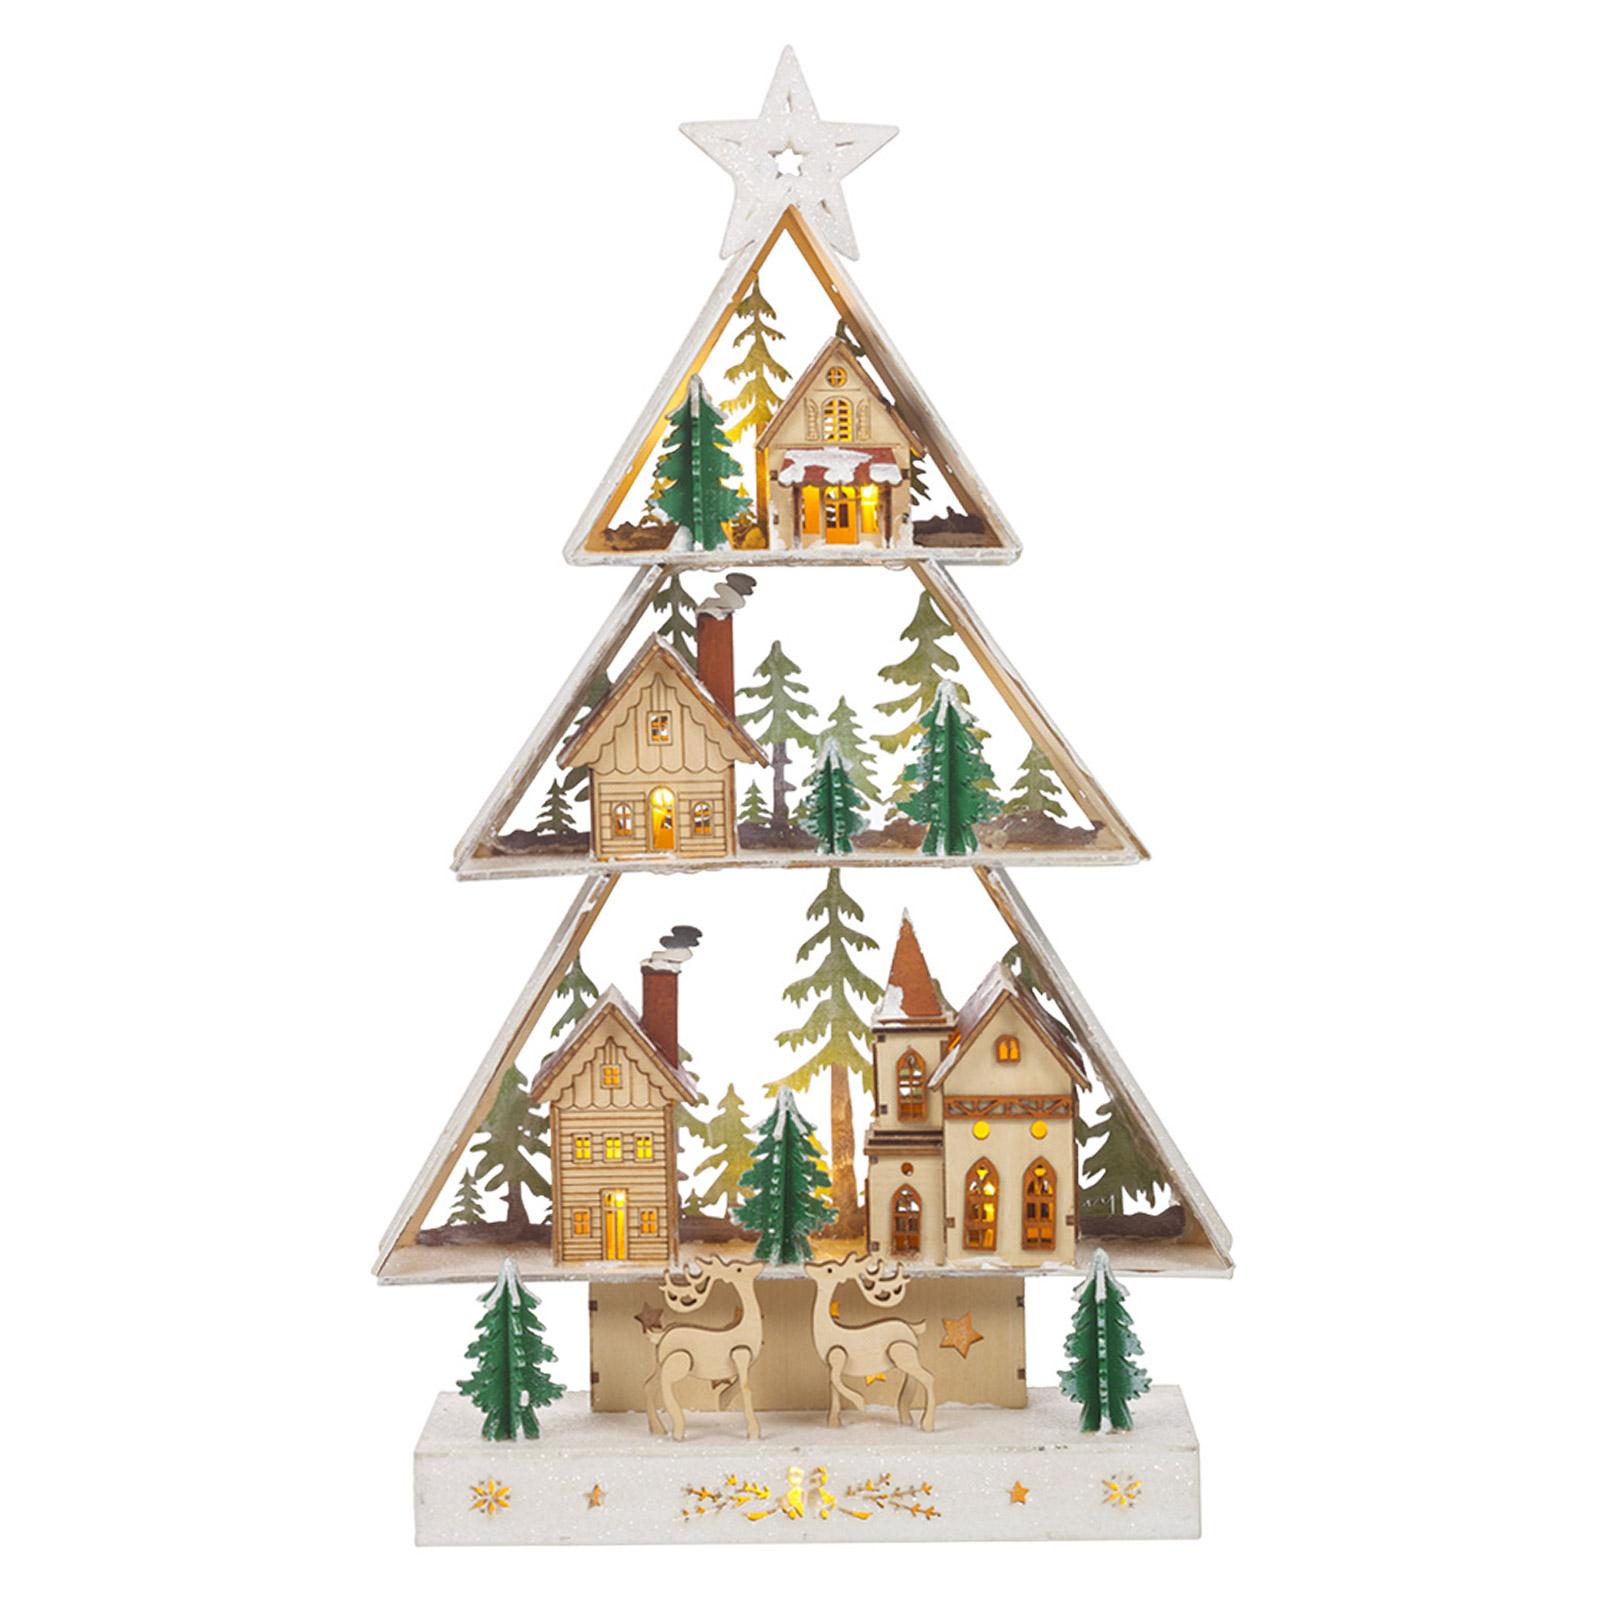 Warm White Wooden Light Up Christmas Tree Decoration Village Scene Ornament Xmas Ebay